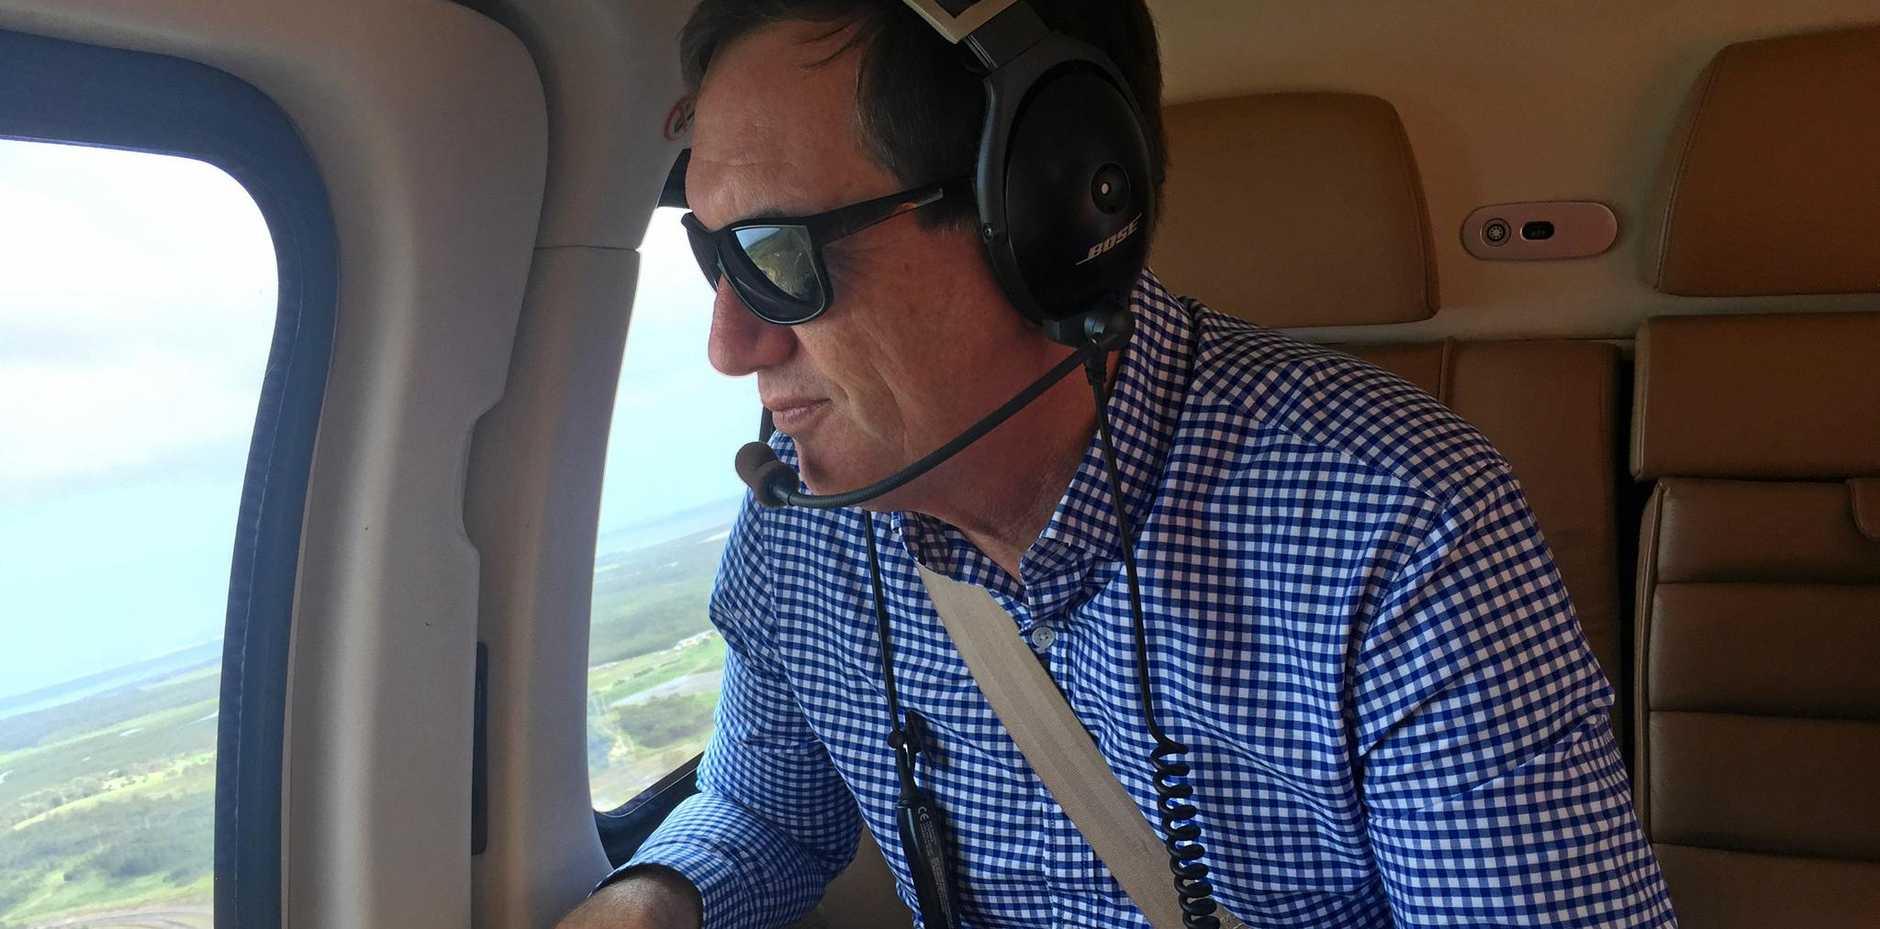 Minister Anthony Lynham flies over the region, inspecting rail damage